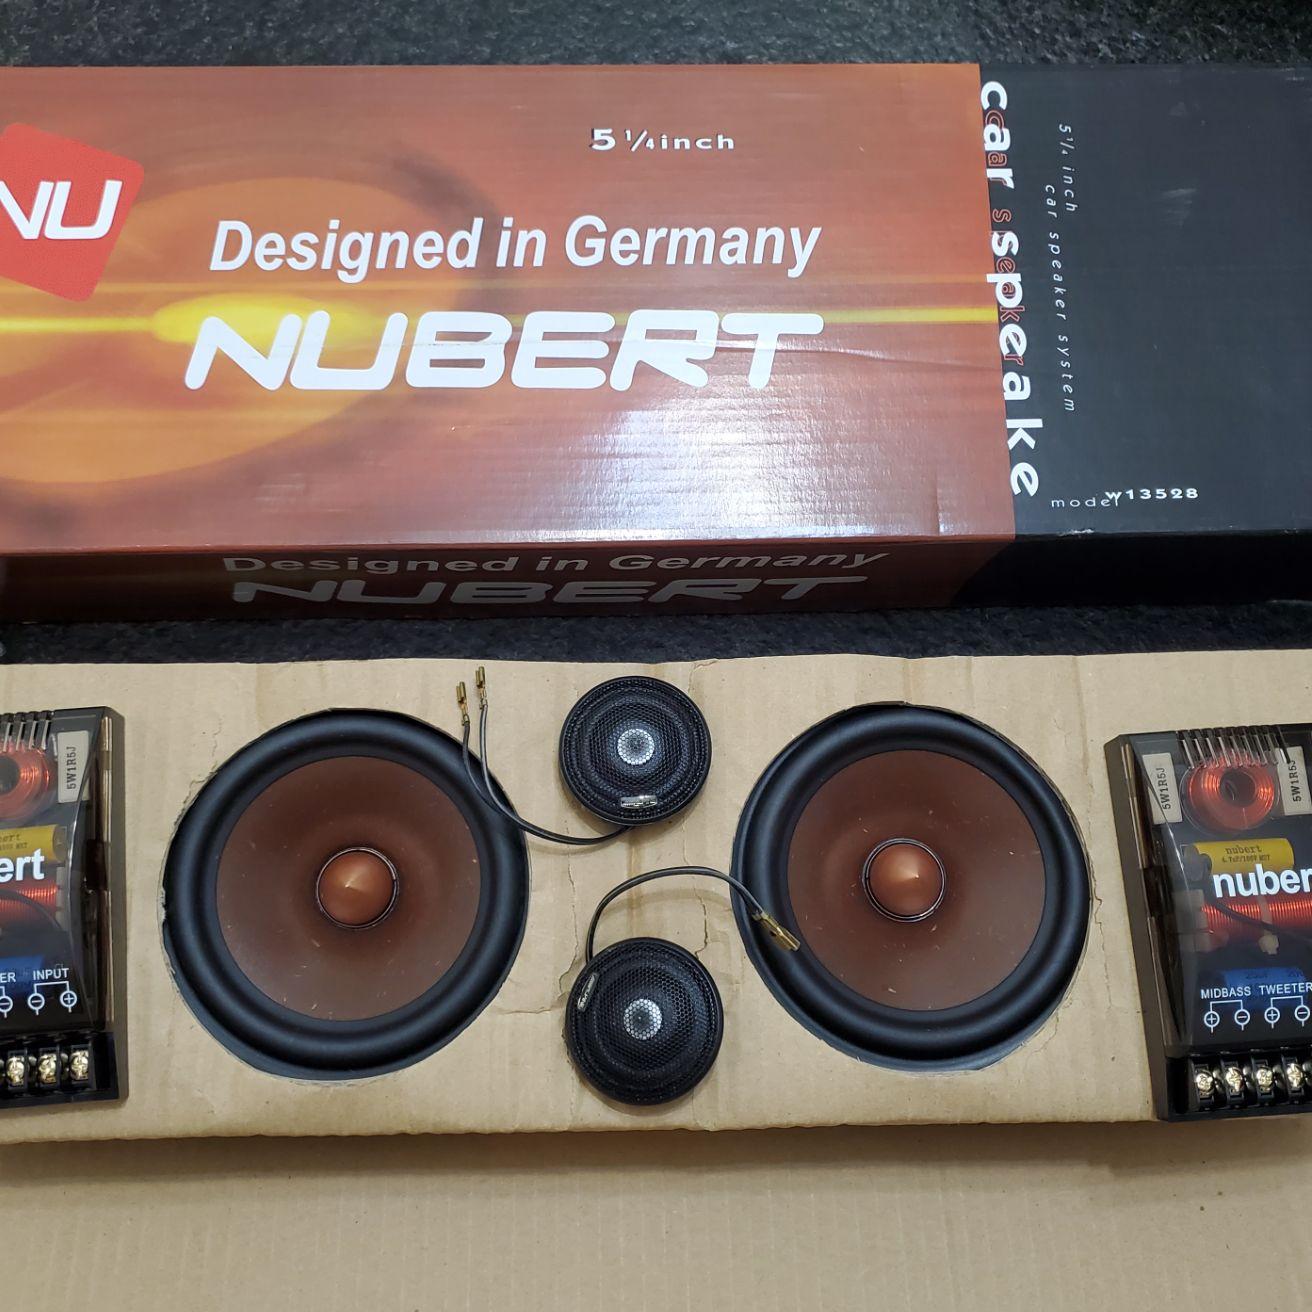 Melo david audio alpine car speaker kit .. alpine tweeter + grass mix paper cone woofer + crossover